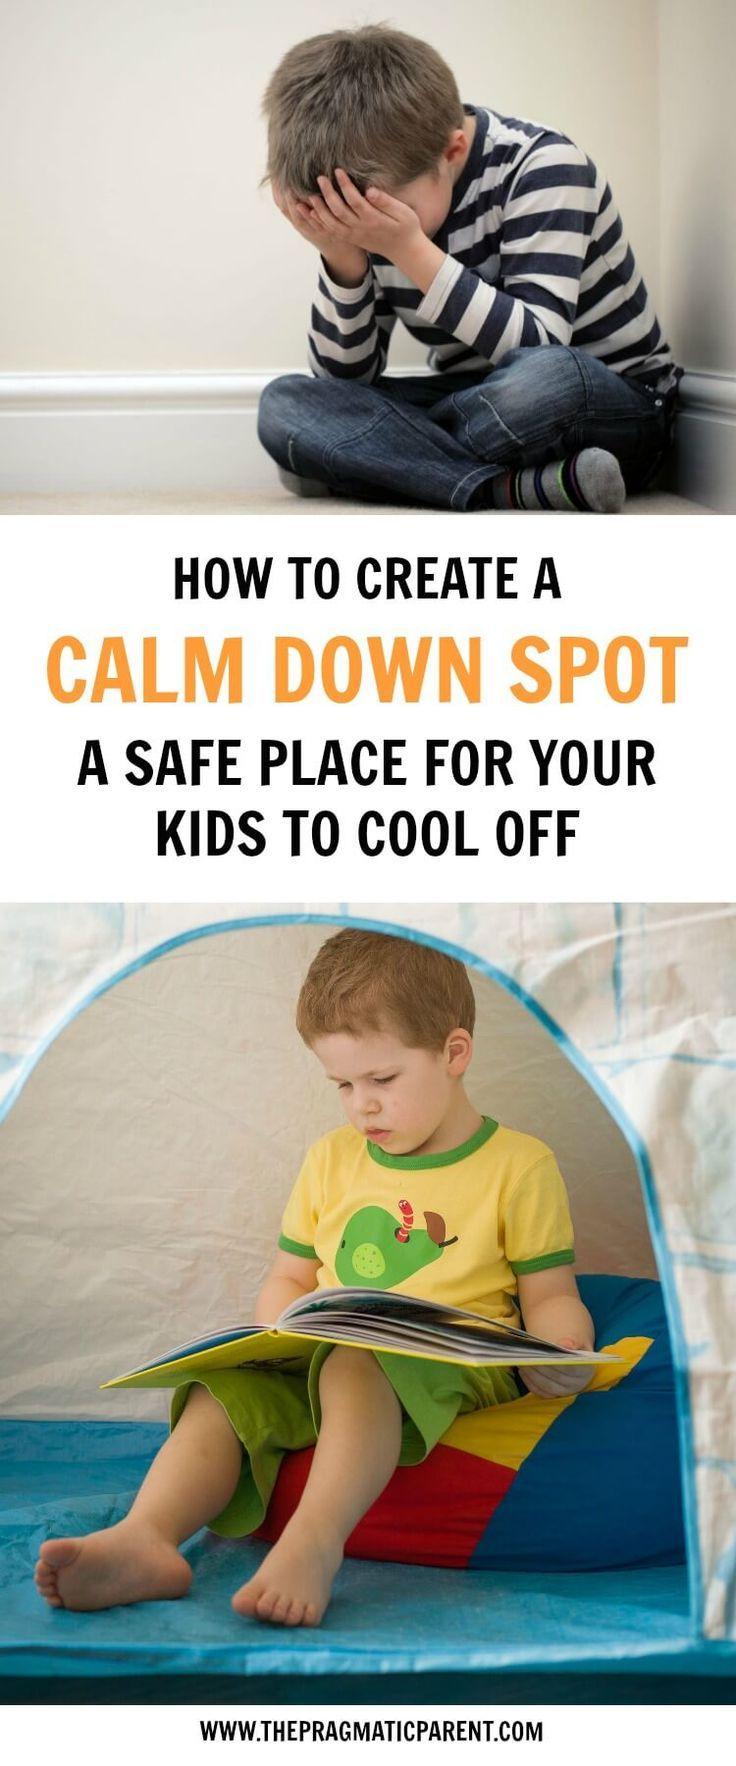 25 Best Ideas About Calm Down Corner On Pinterest Calm